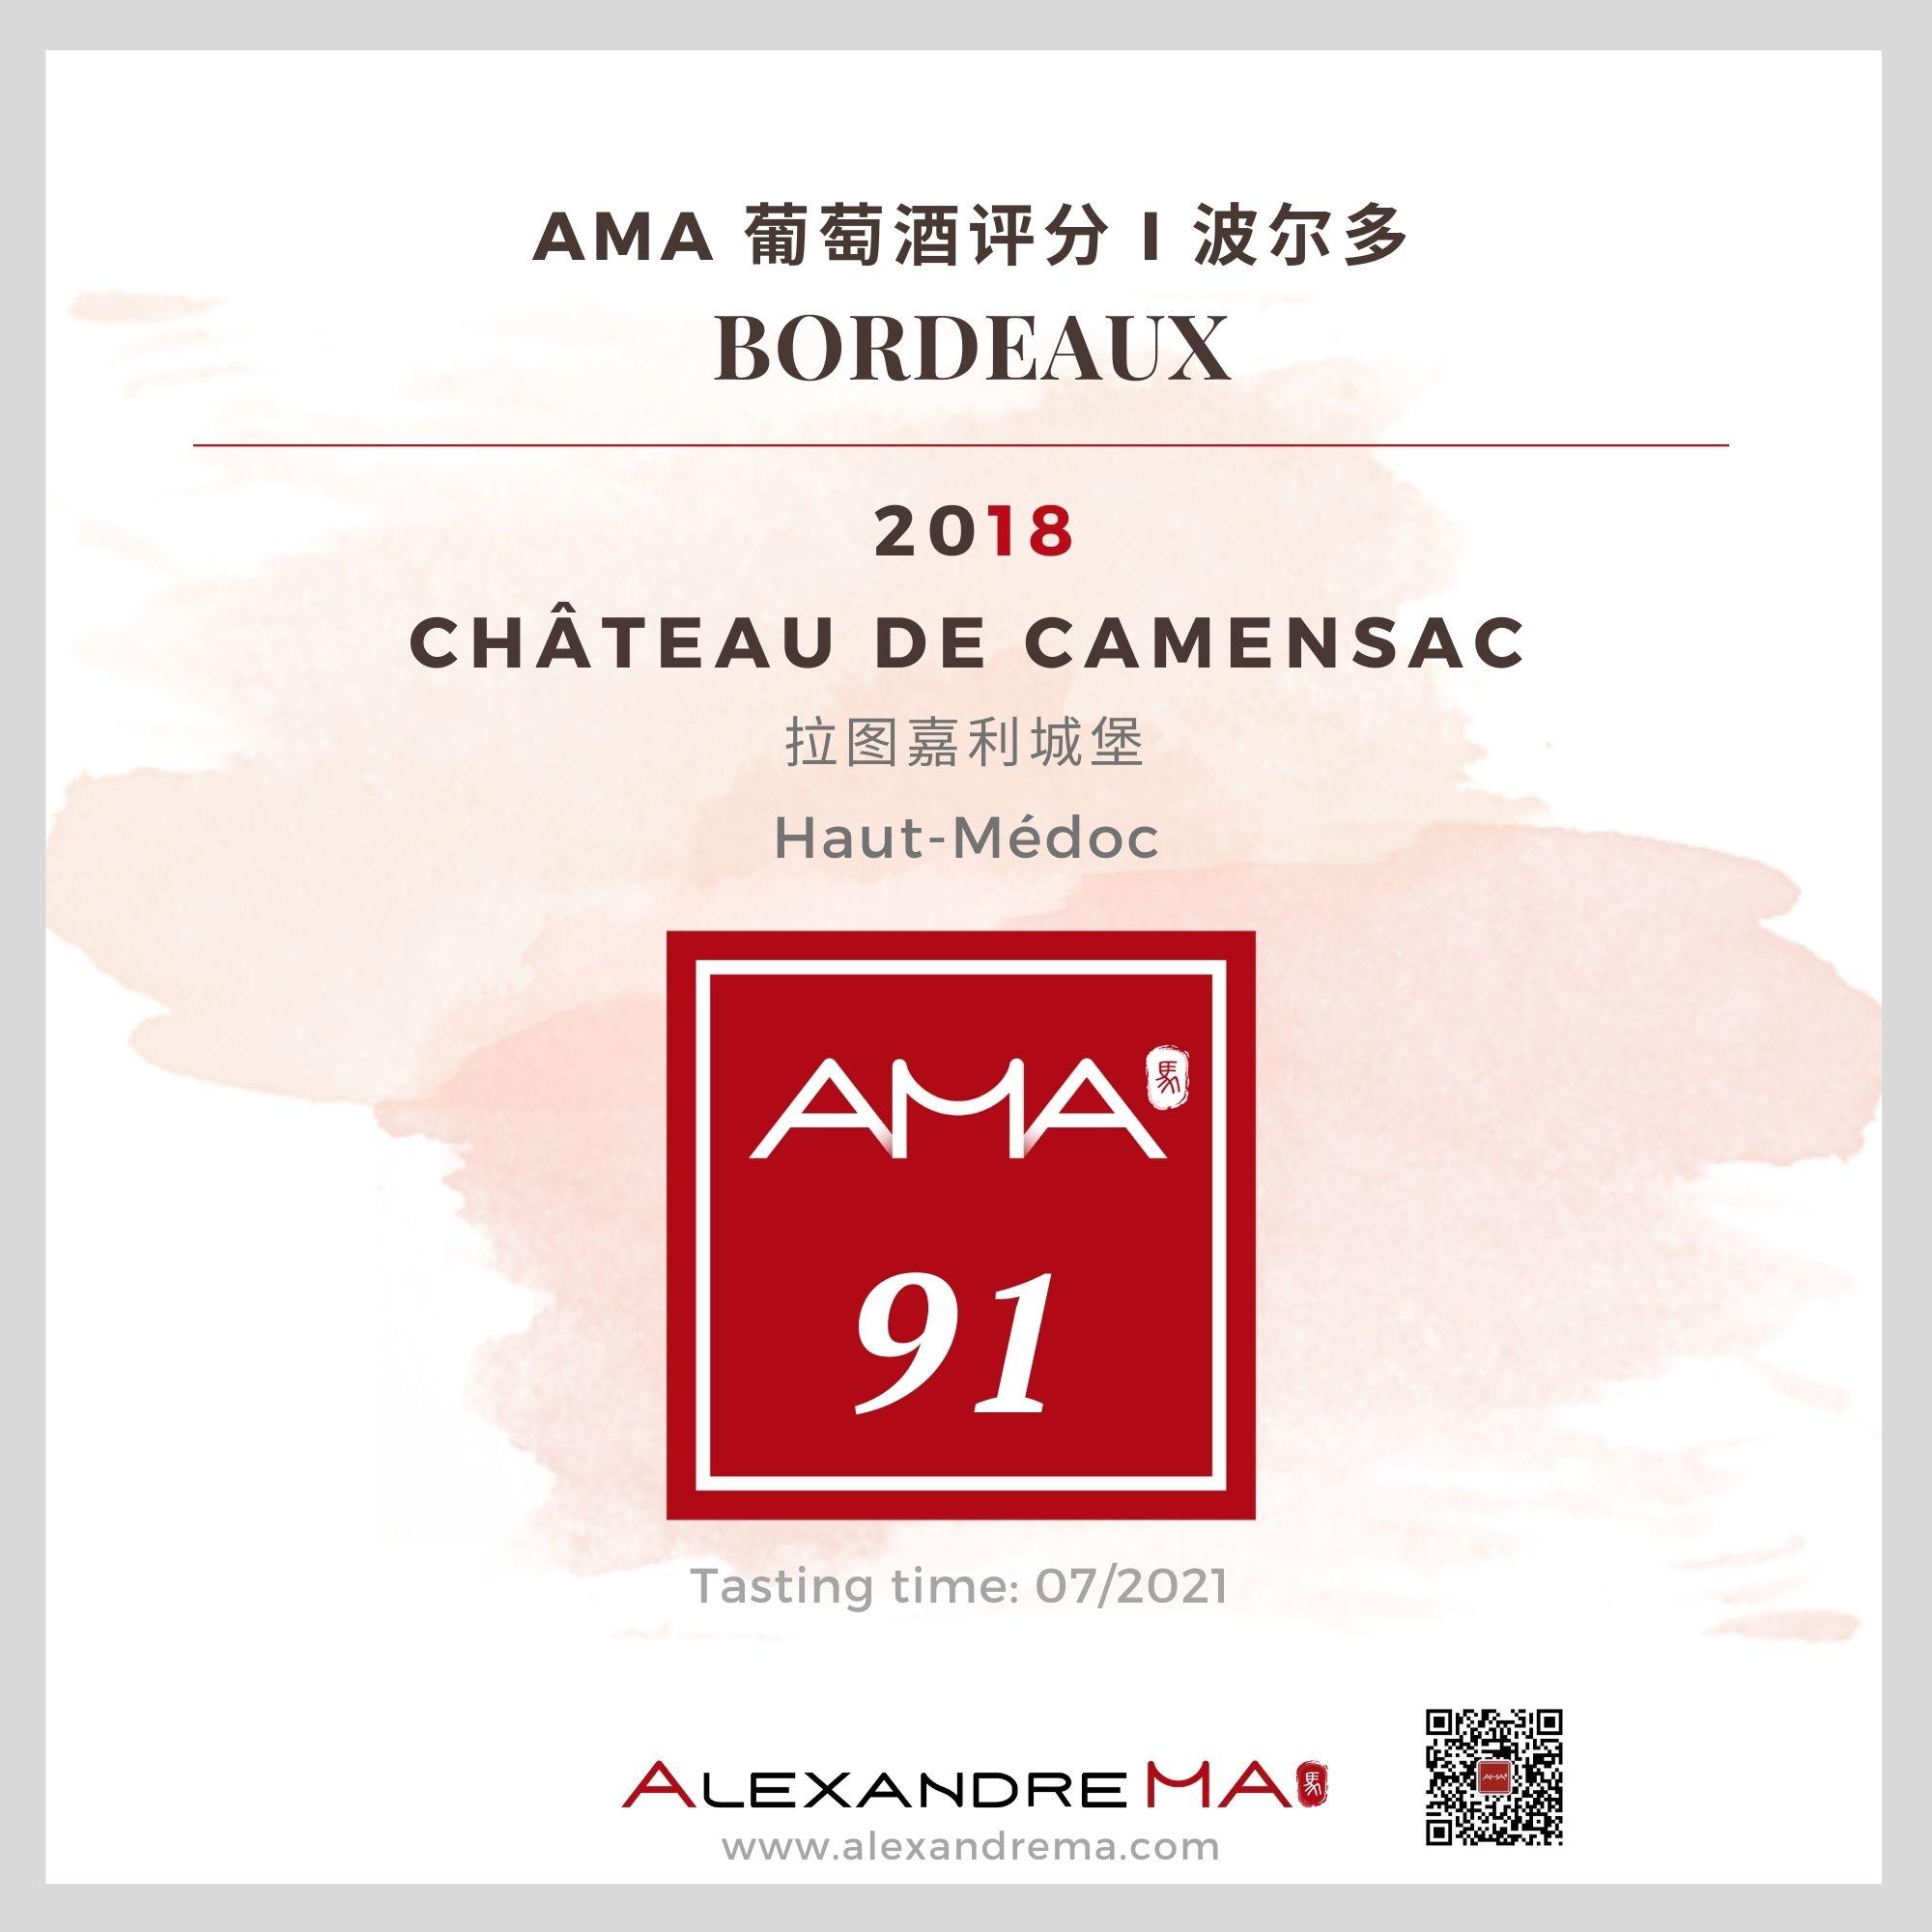 Château de Camensac 2018 卡门萨克古堡 - Alexandre Ma